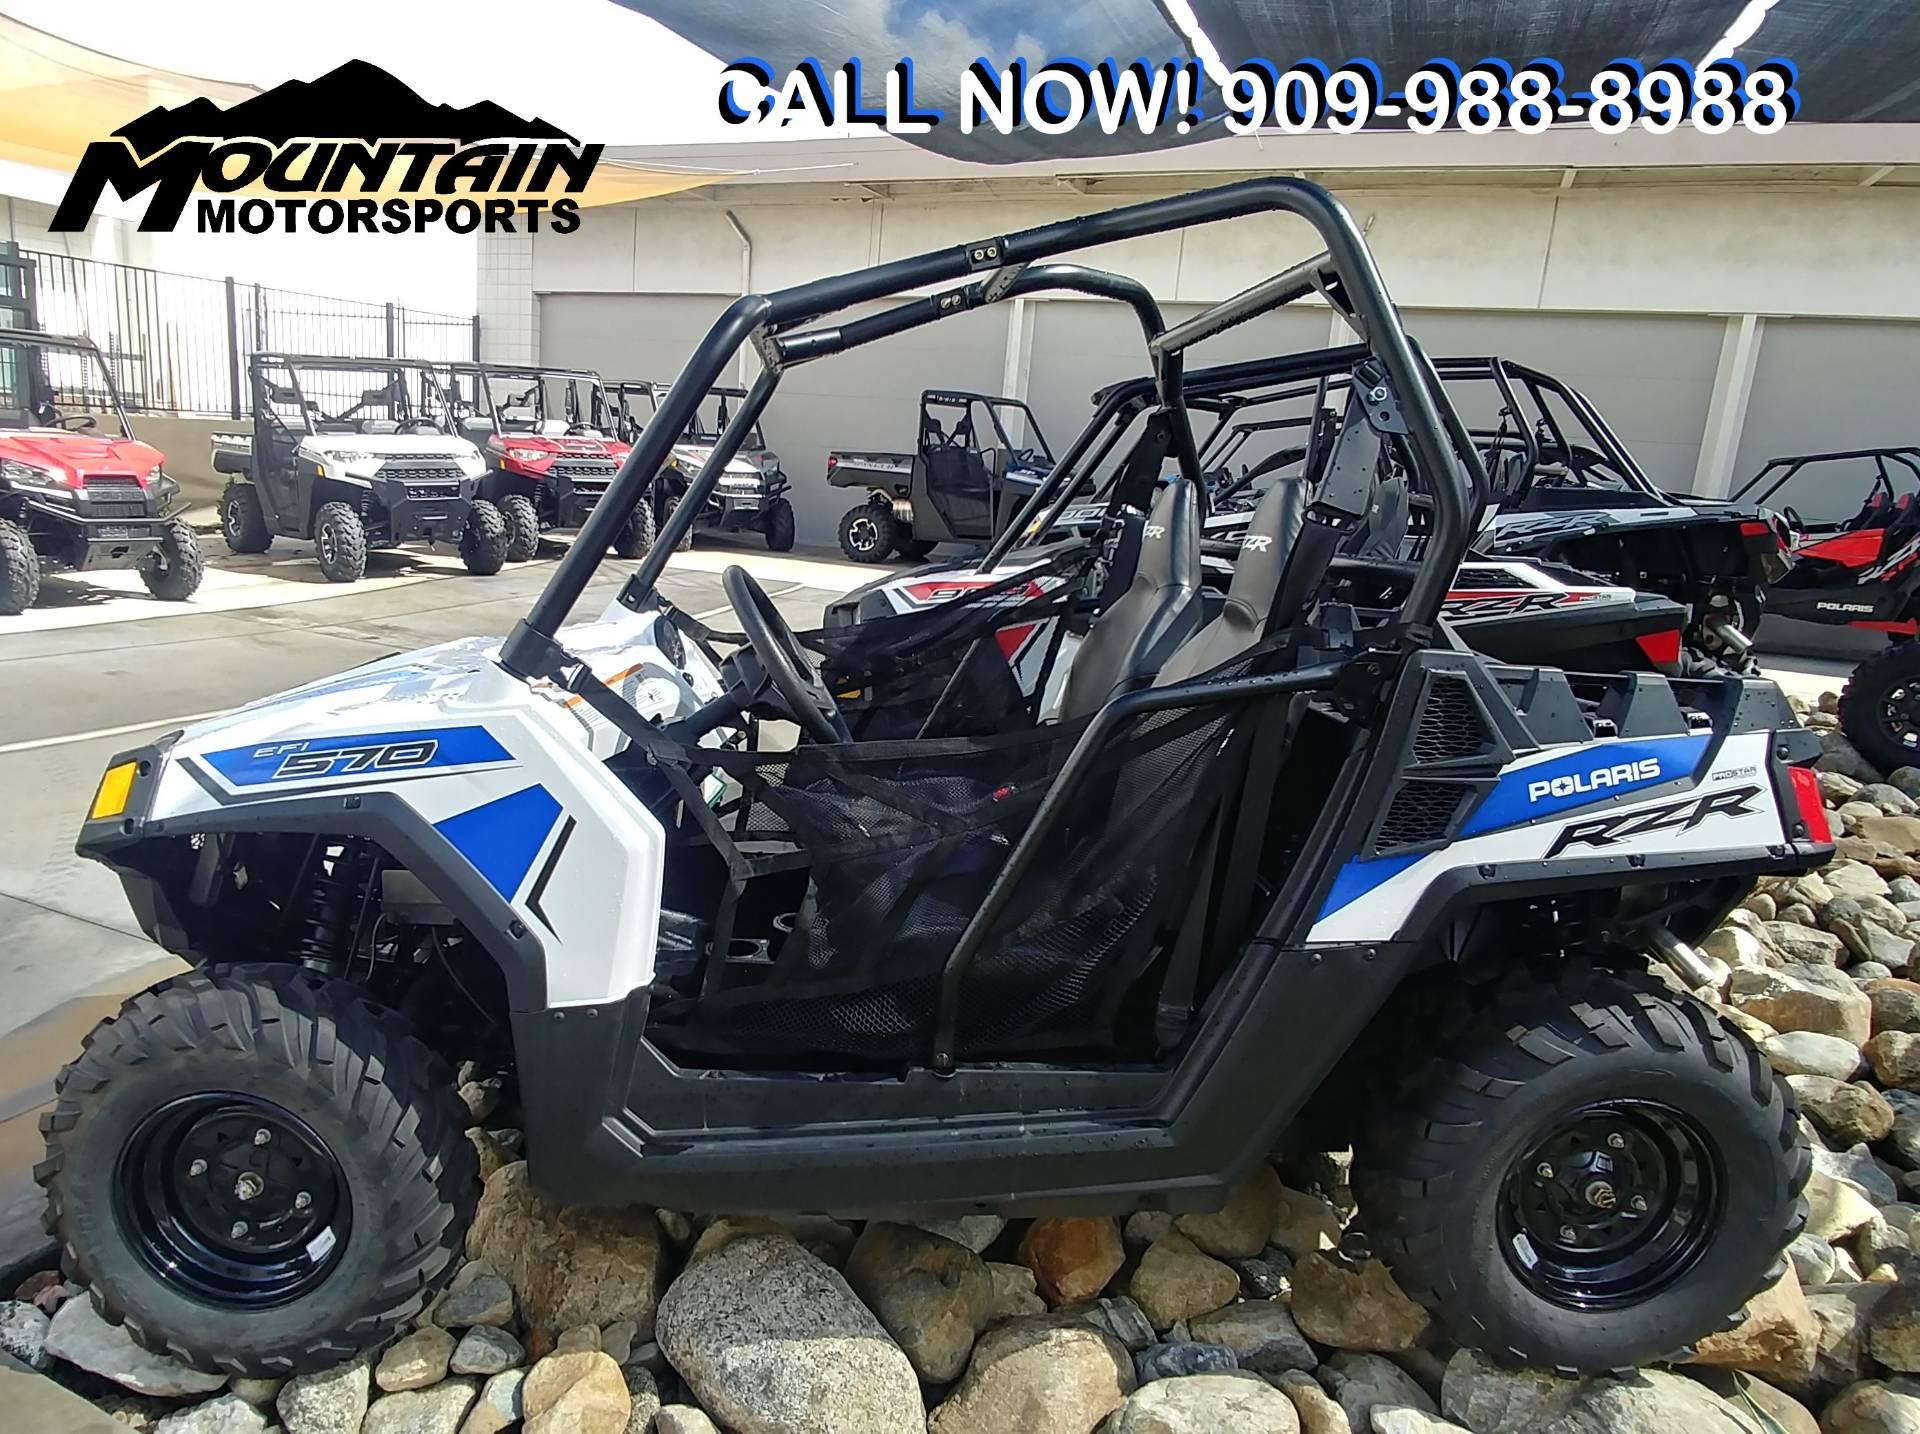 2018 Polaris RZR 570 for sale 33867